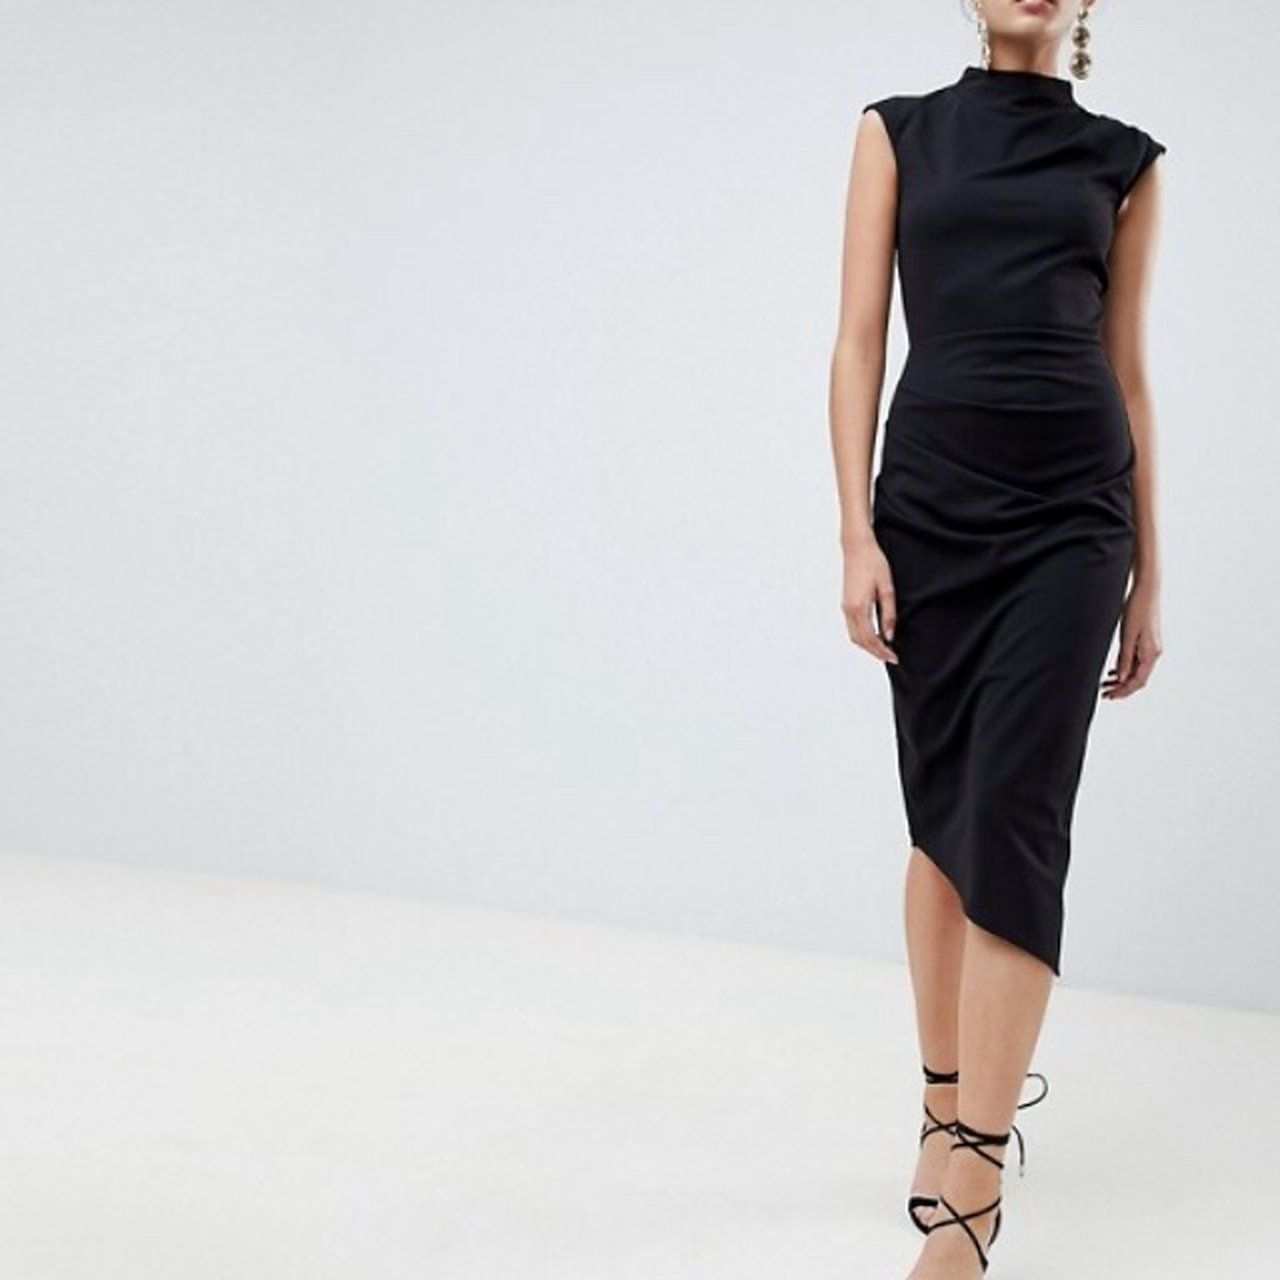 Worn Once Asos Black Midi Bodycon Dress Size 12 Message Depop Black Midi Dress Bodycon Midi Dress Bodycon Bodycon Dress [ 1280 x 1280 Pixel ]